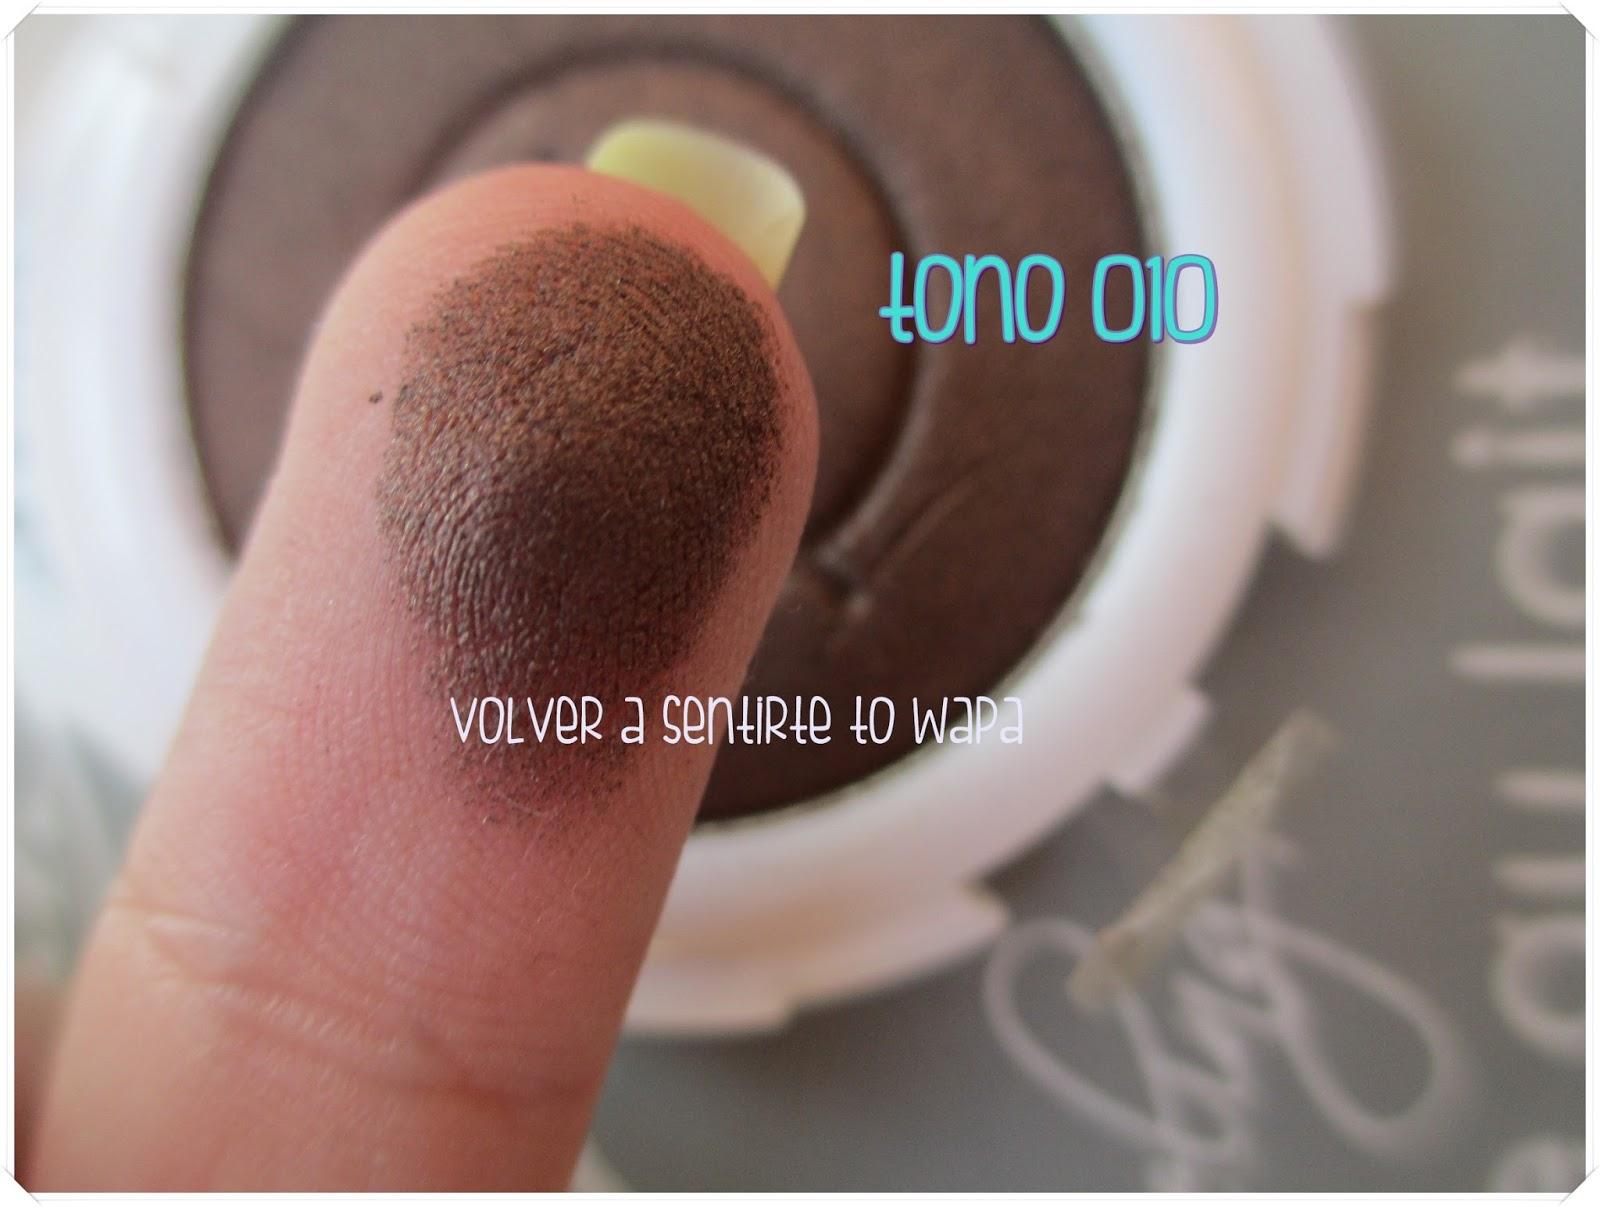 Sombras mono de Flormar - Otoño 2014 - Tono 010 Swatch